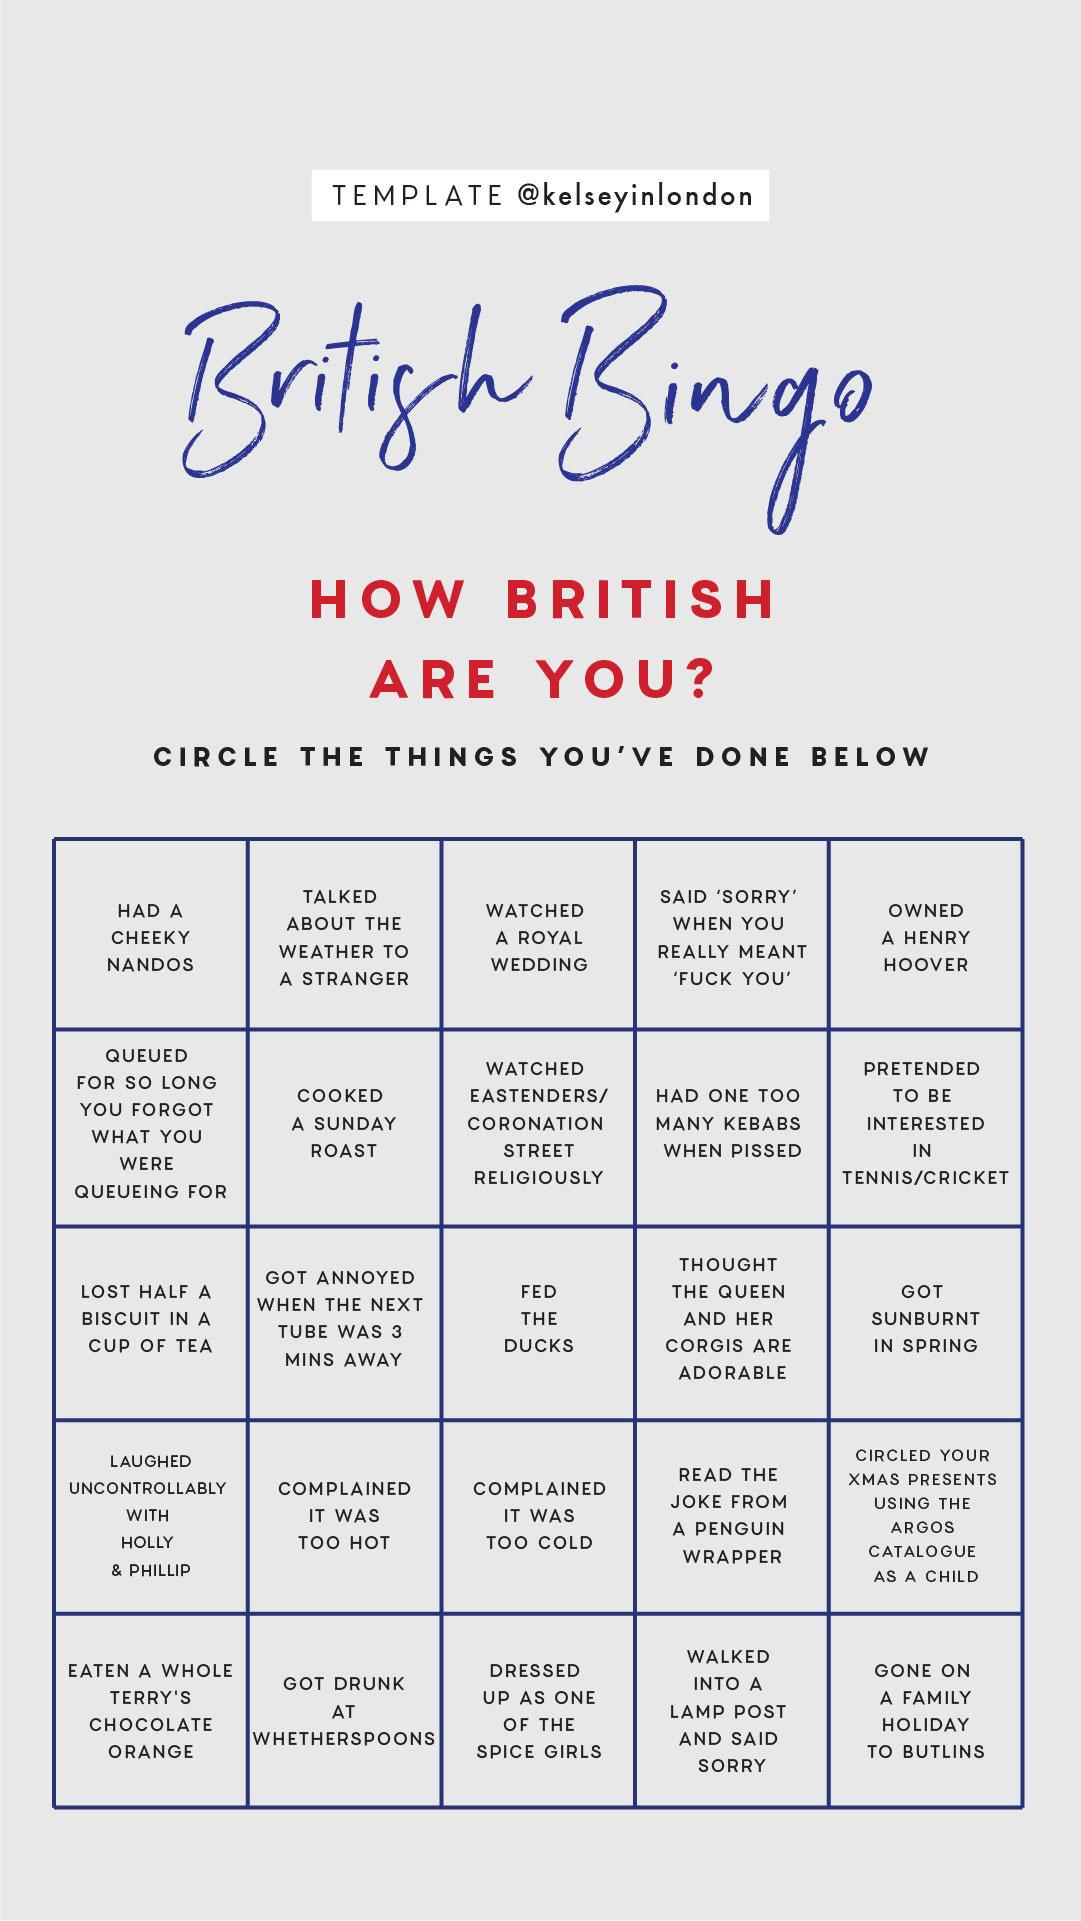 Top things to do in United Kingdom Bucket list Instagram Story Template kelseyinlondon Kelsey Heinrichs What to do in United Kingdom Where to go in United Kingdom top places in United Kingdom